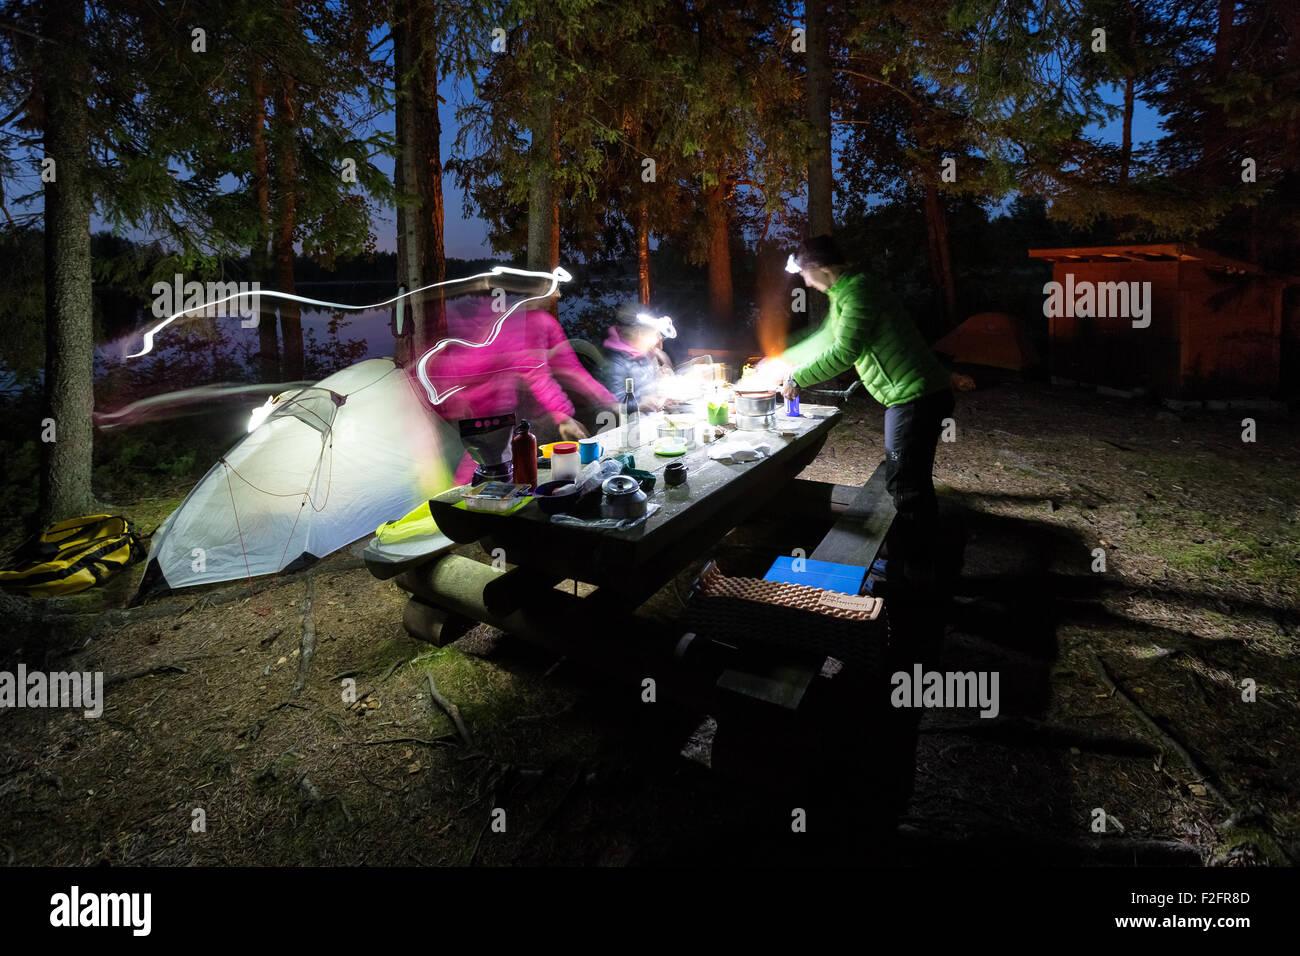 Dinner preparations at Pirkonsaari island, Petäjävesi, Finland, Europe, EU - Stock Image